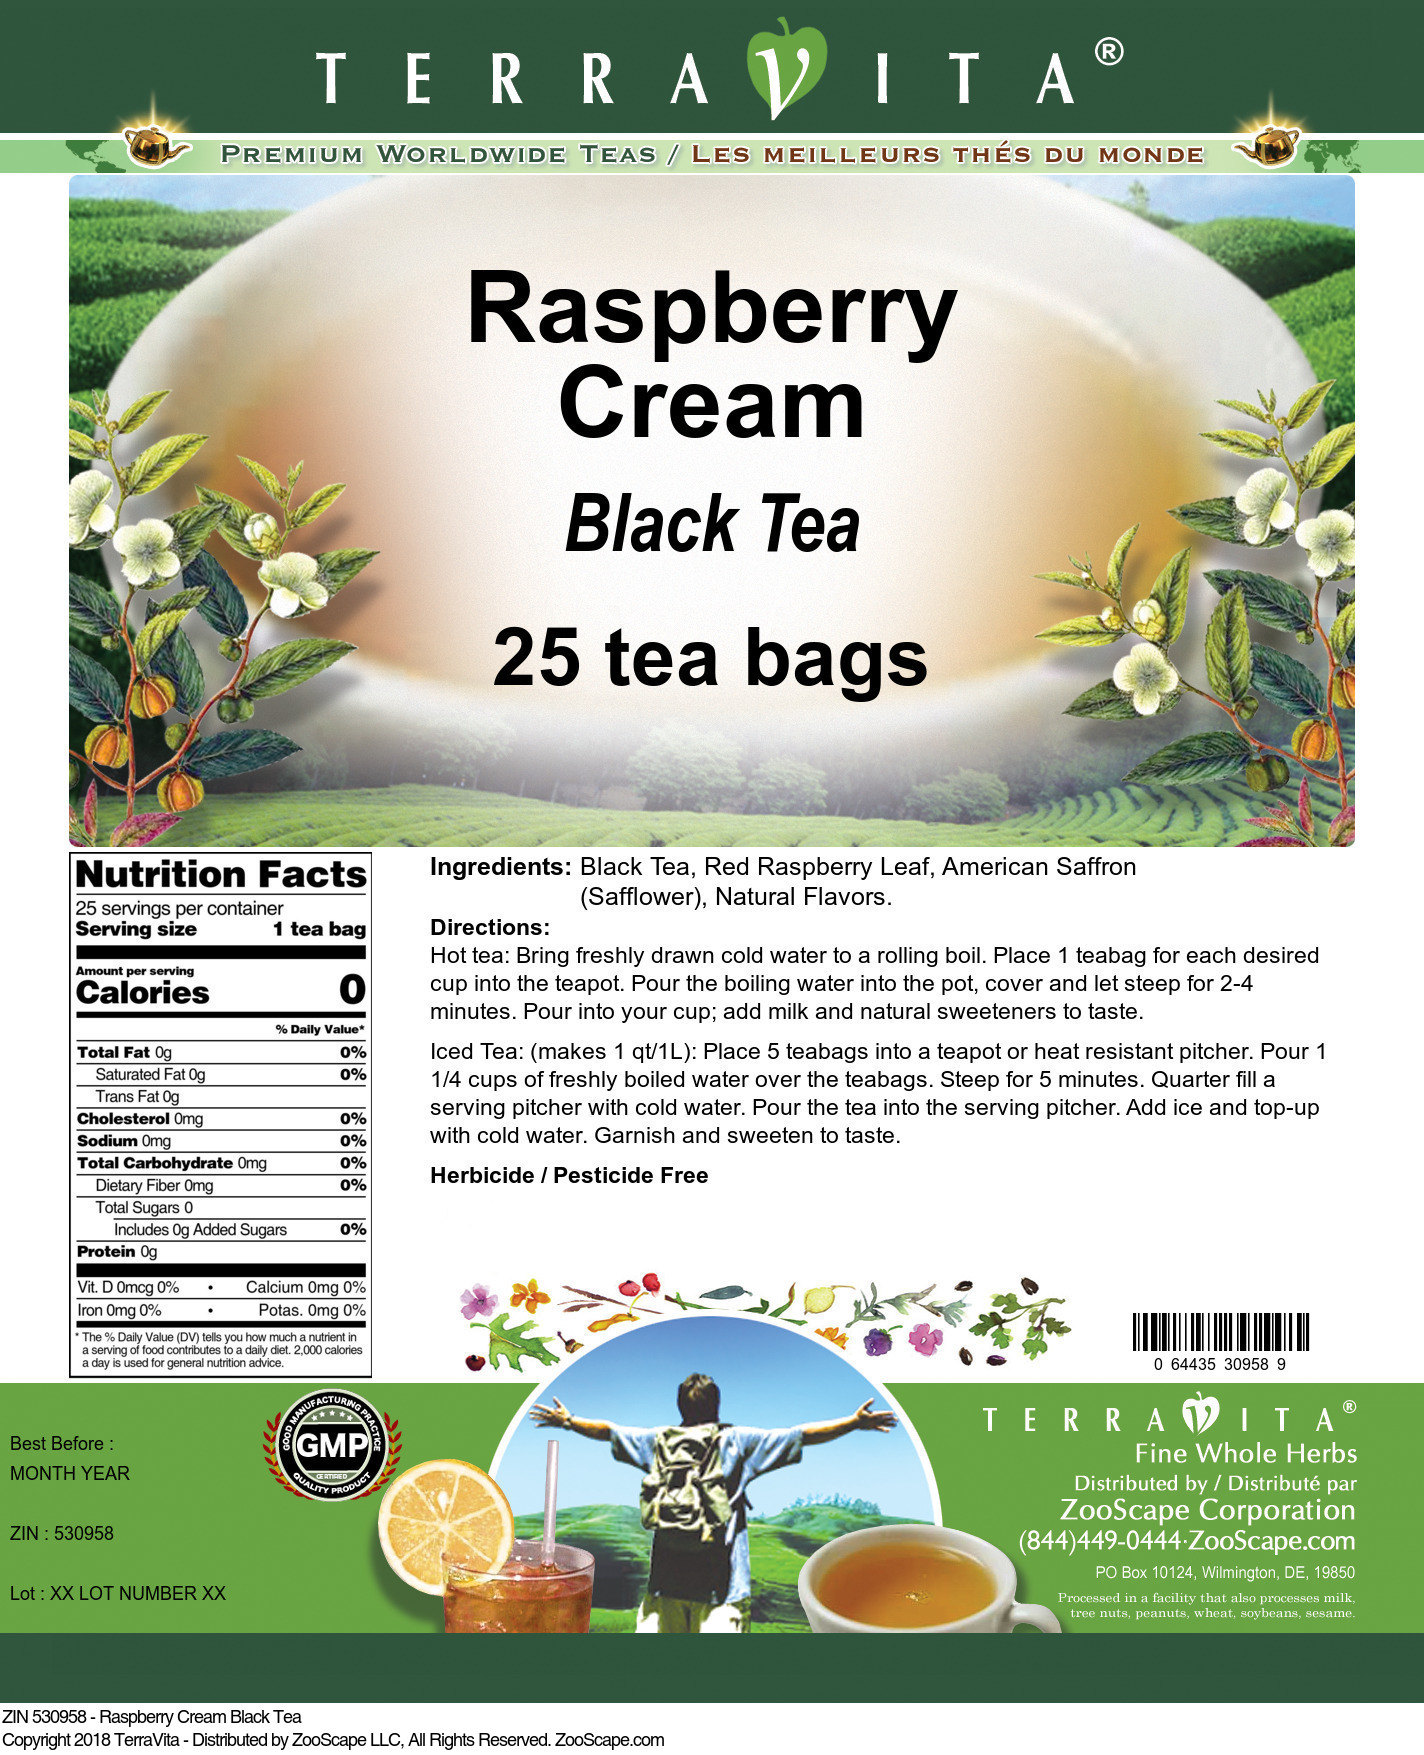 Raspberry Cream Black Tea